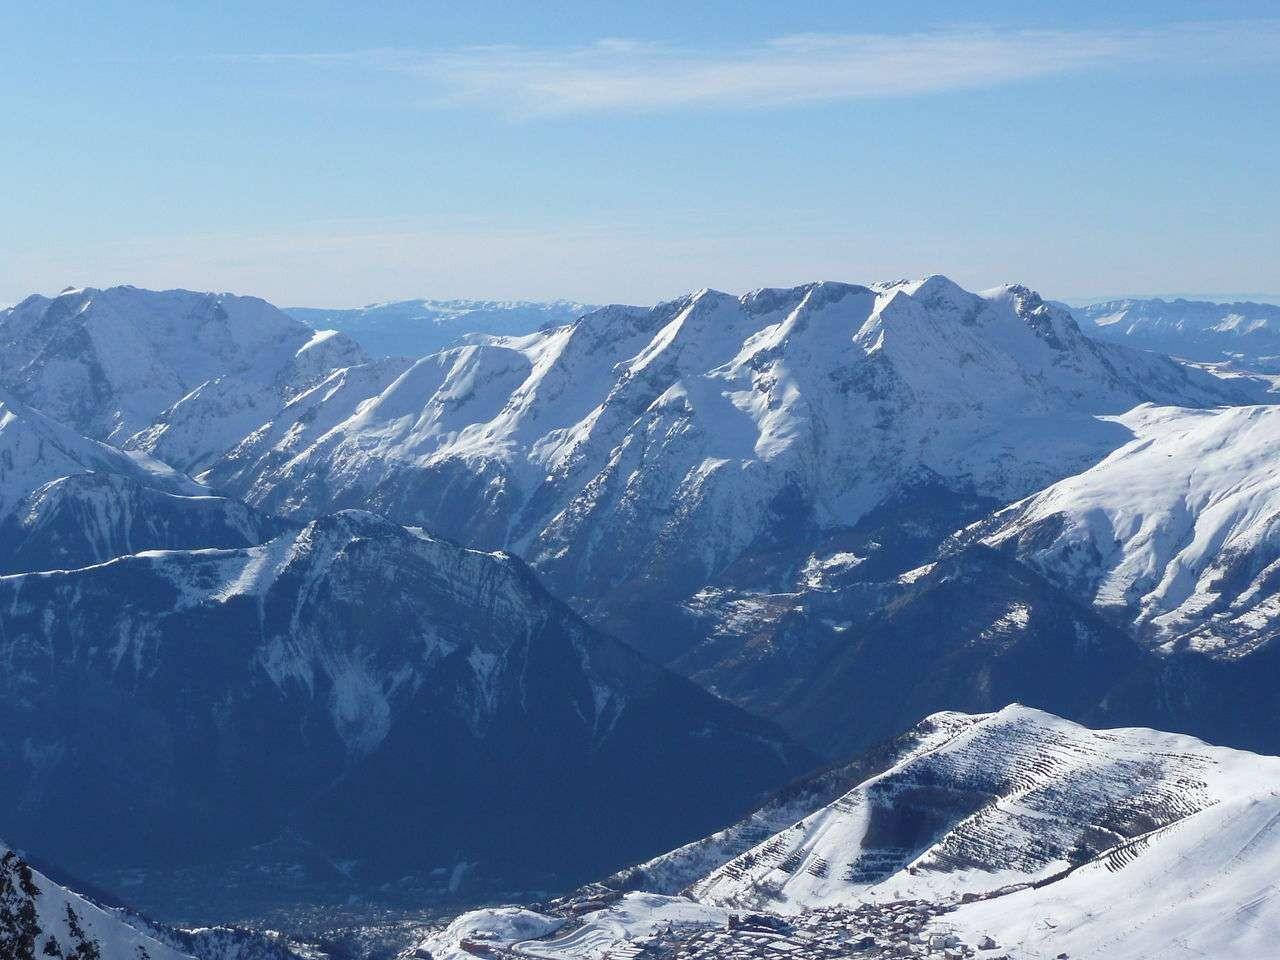 La montagne en Europe